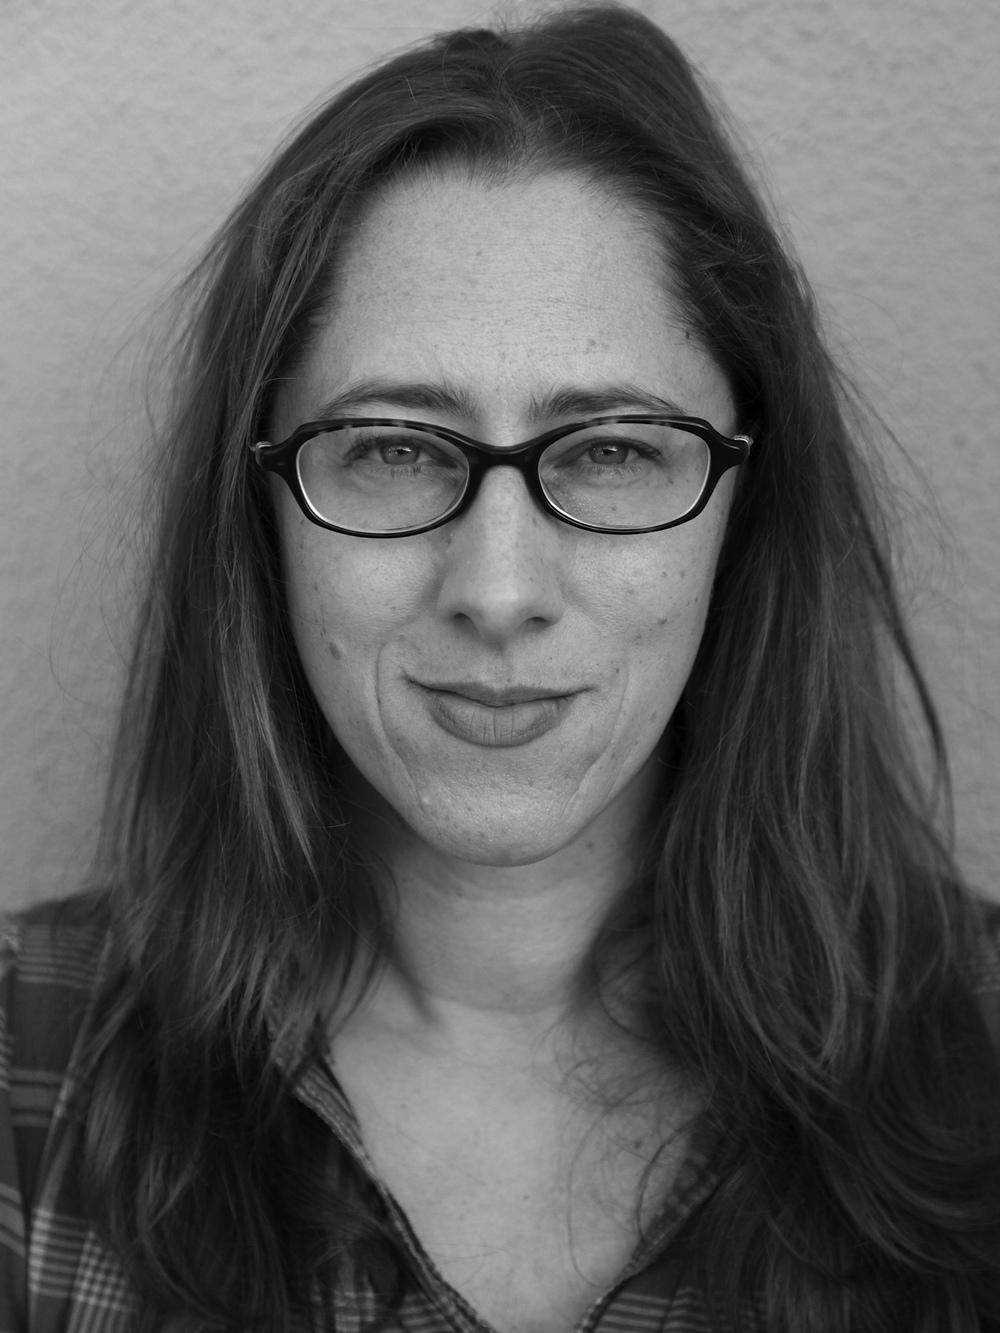 AMERICAN FILMMAKER Maya Forbes